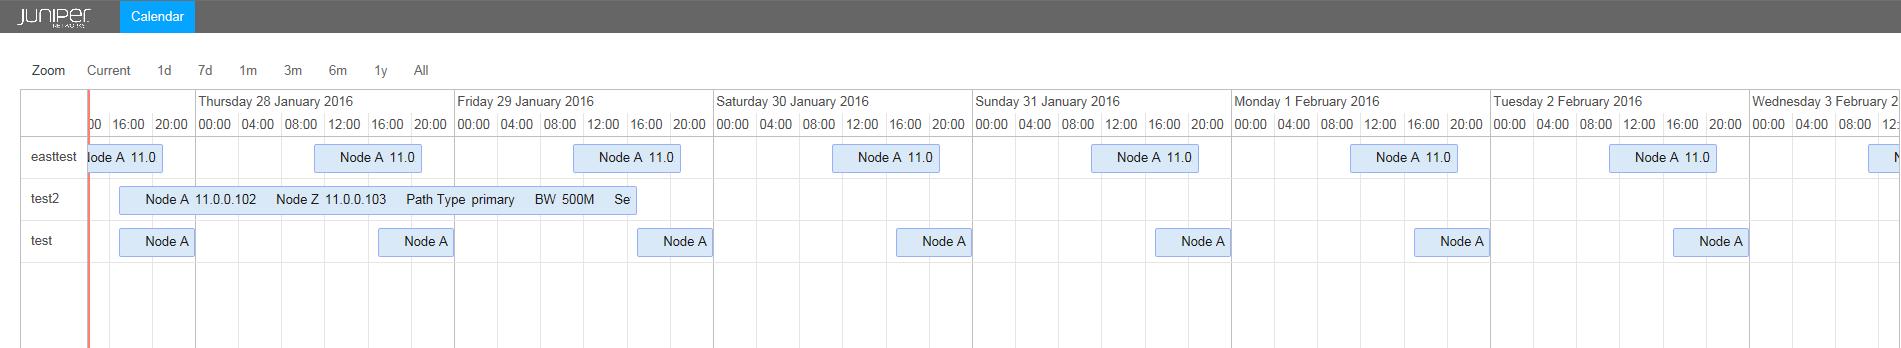 Bandwidth Calendar - TechLibrary - Juniper Networks